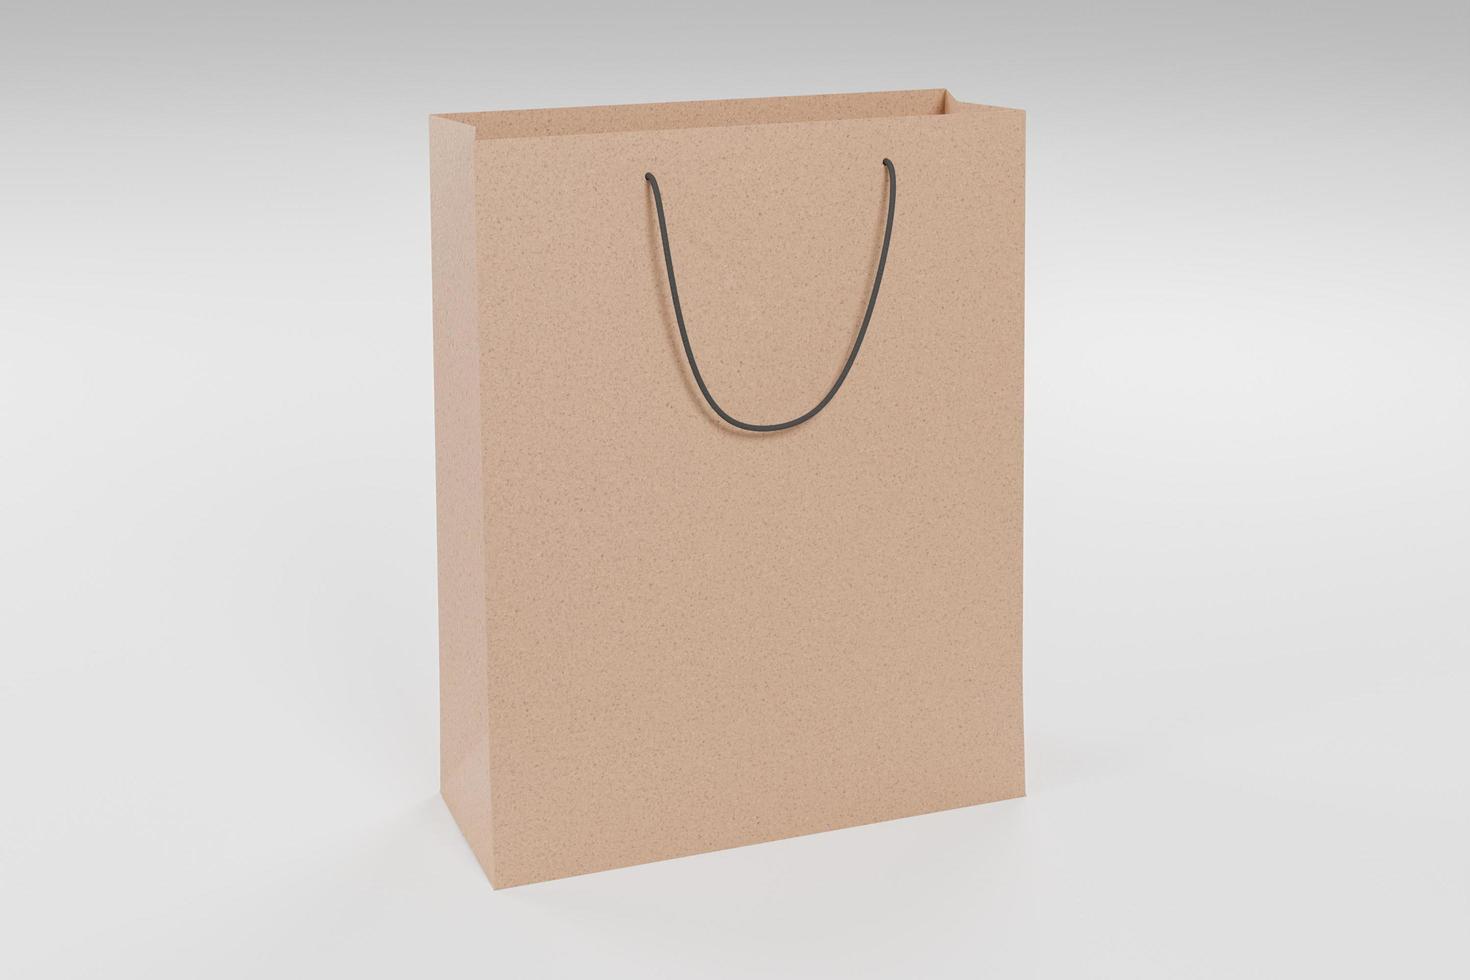 3D mockup of cardboard shopping bag photo